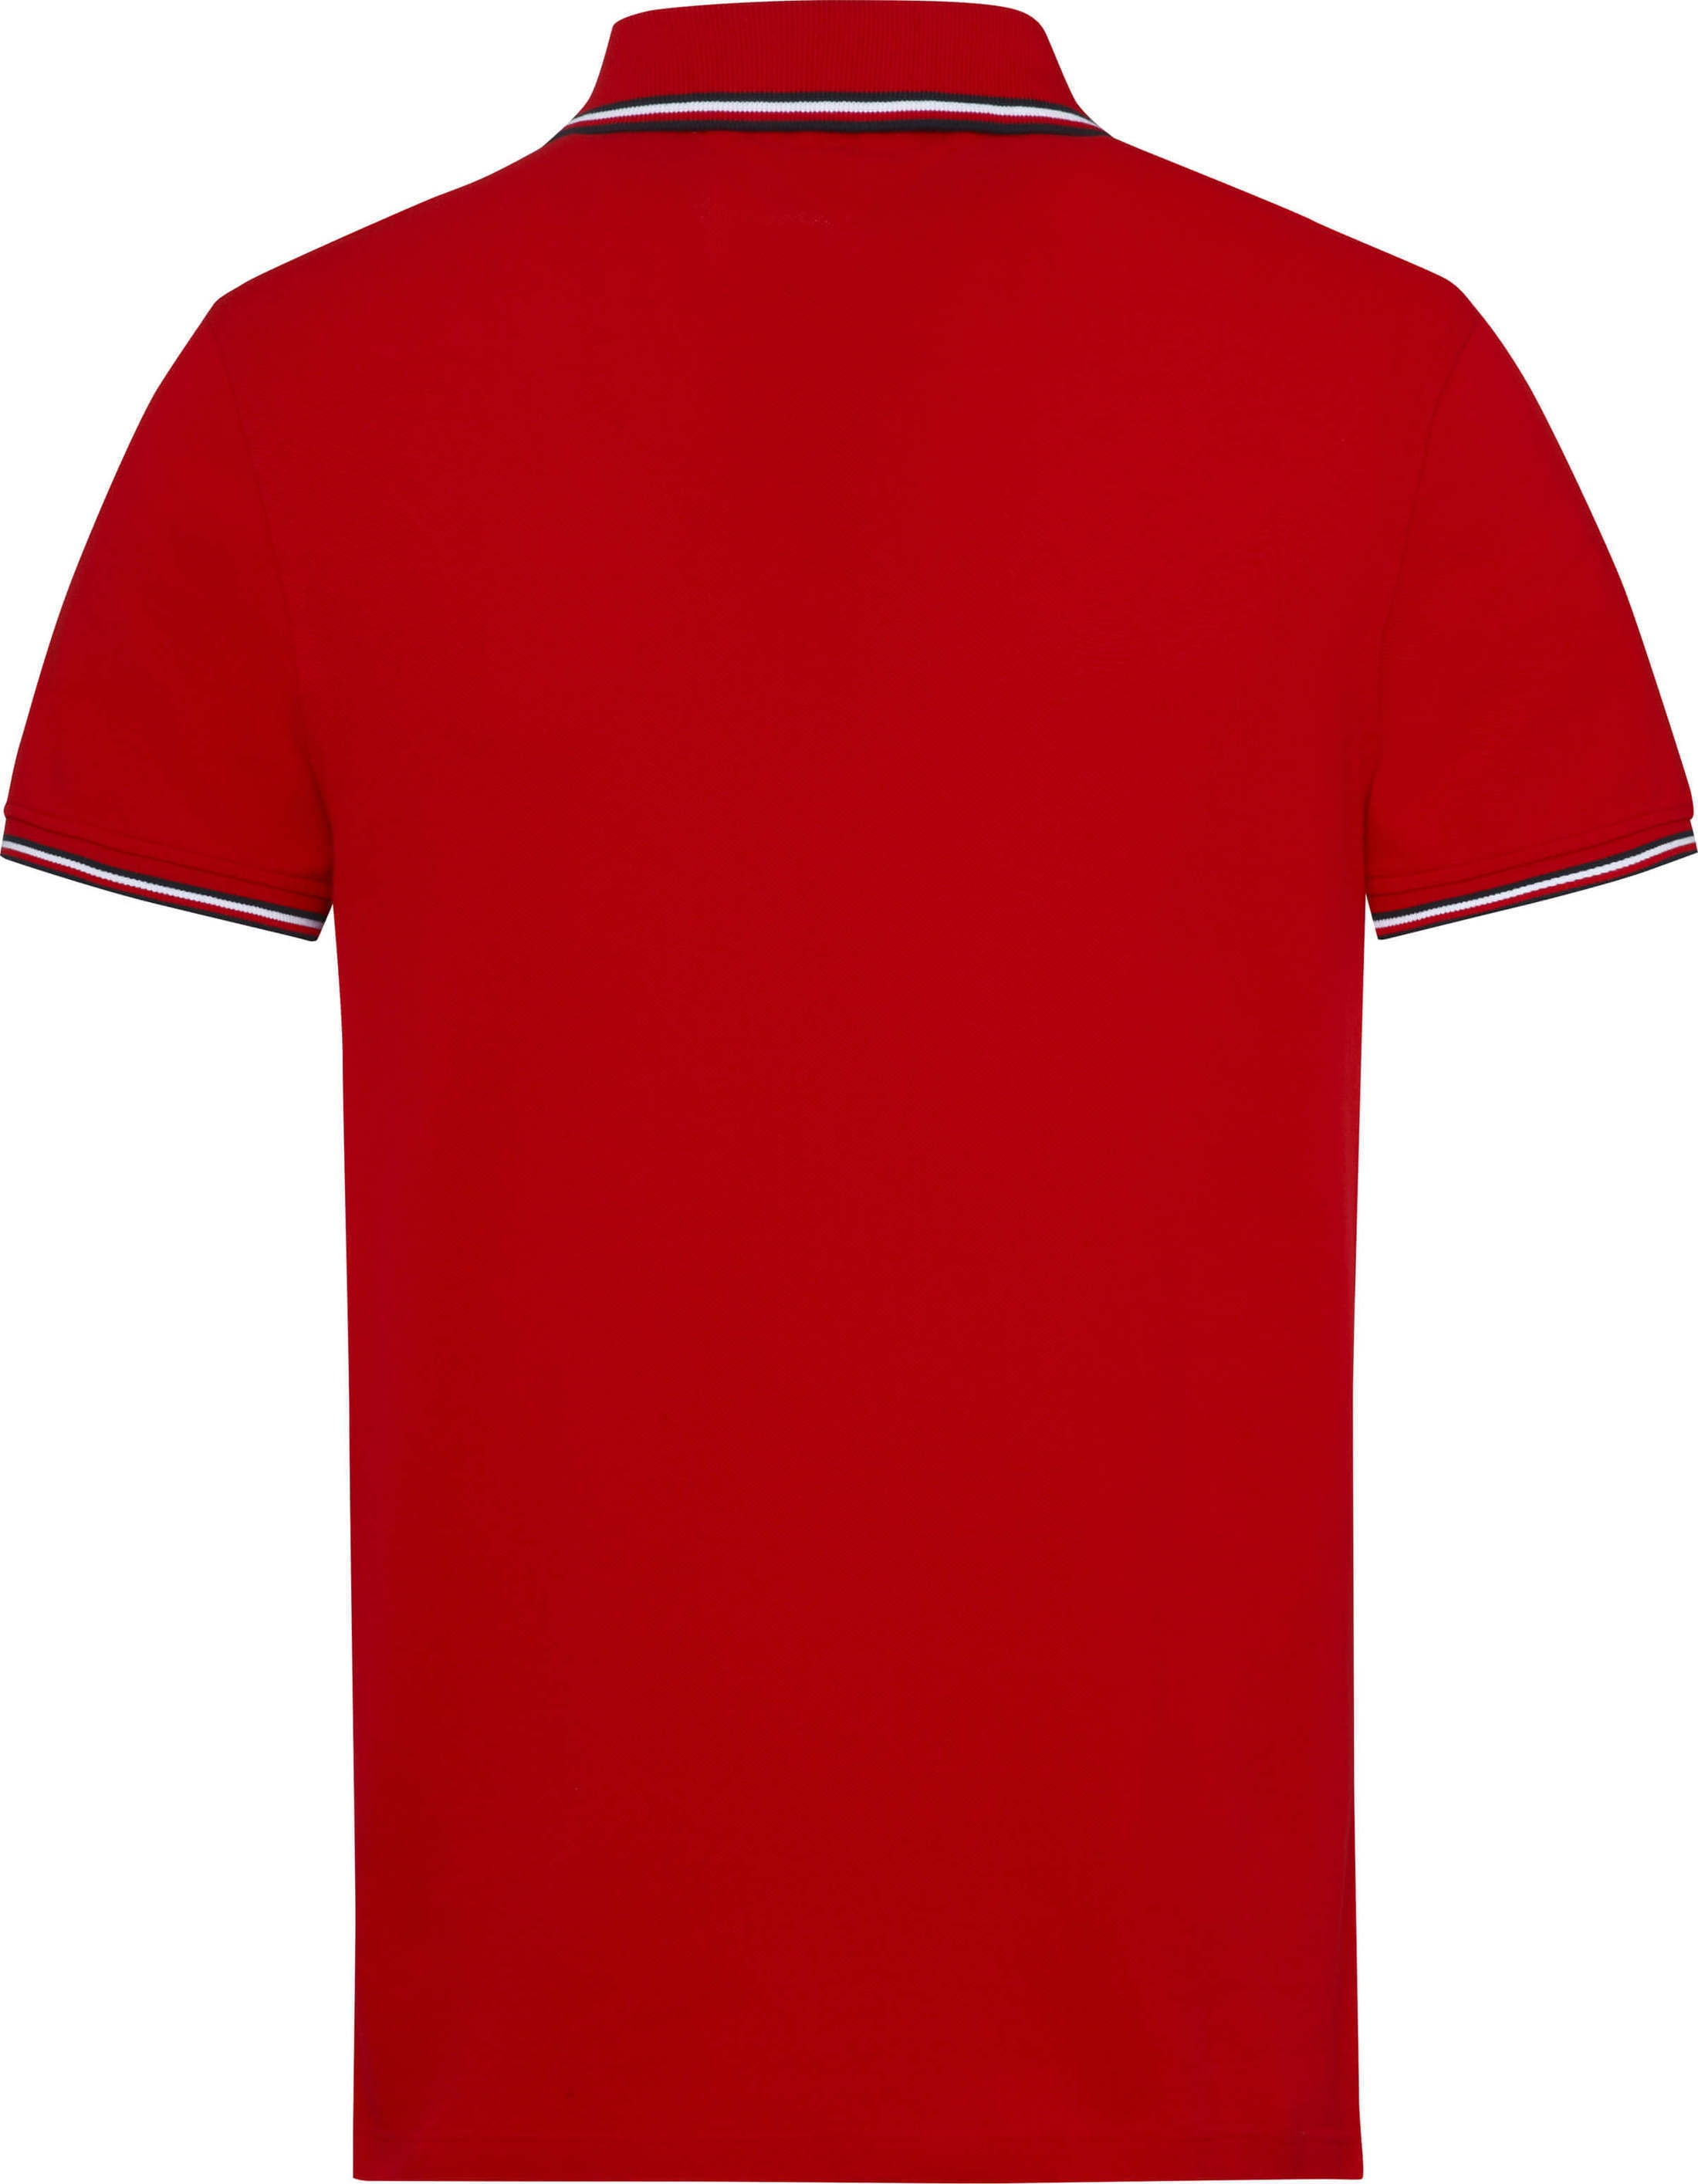 Tommy Hilfiger Stripes Poloshirt Red foto 2